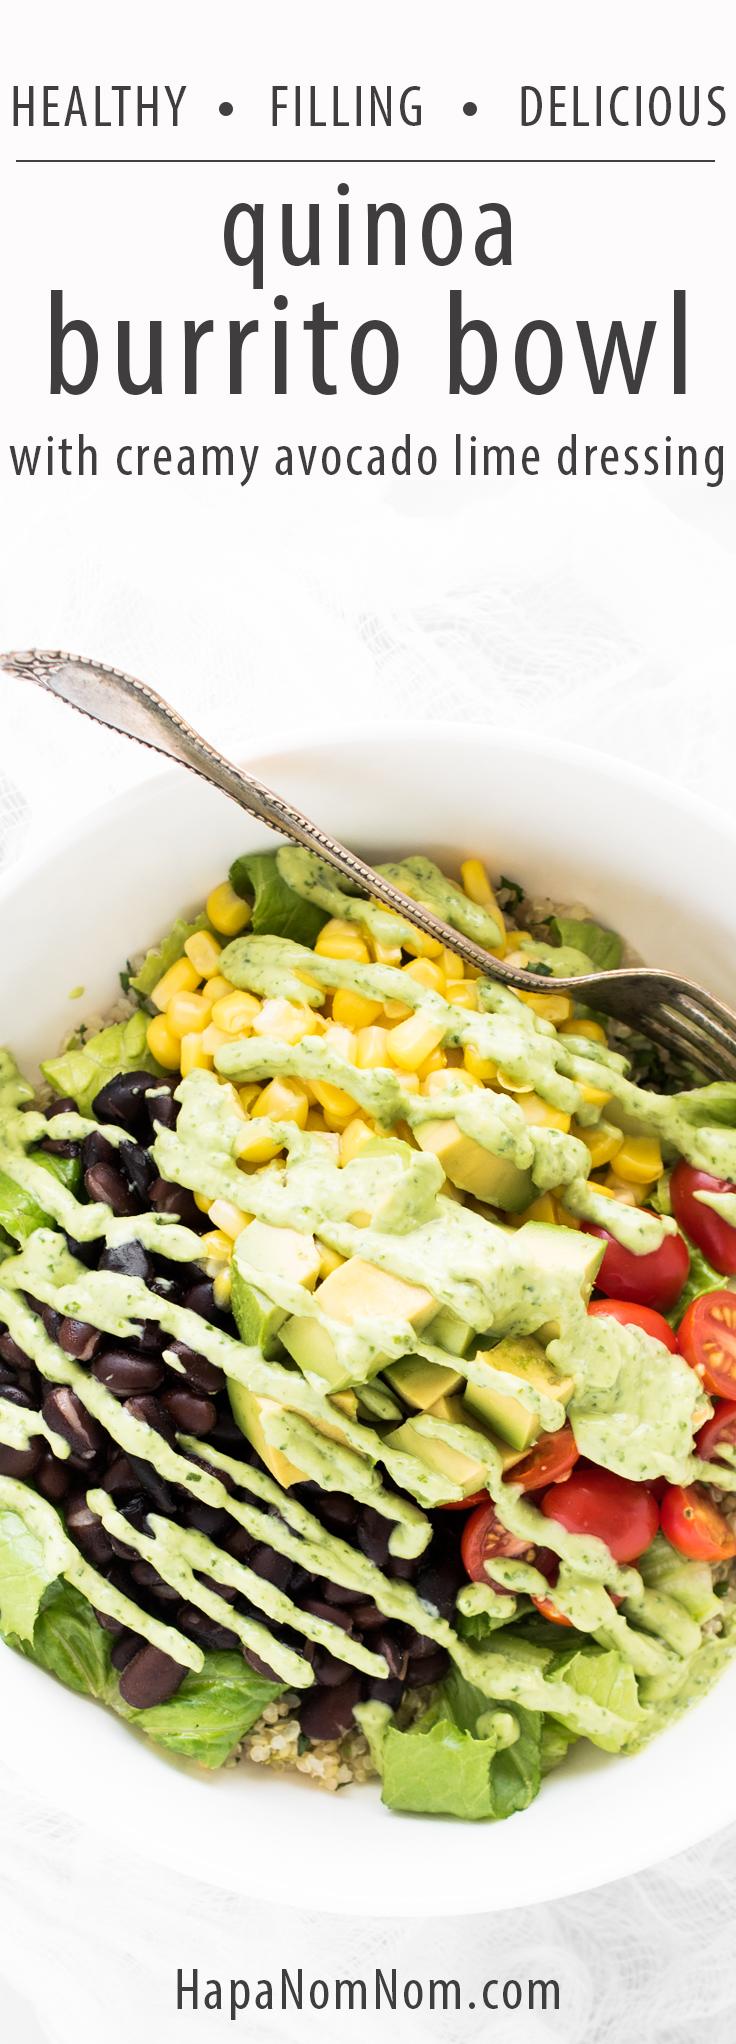 Super delicious and filling Quinoa Burrito Bowl with creamy Avocado-Lime Dressing